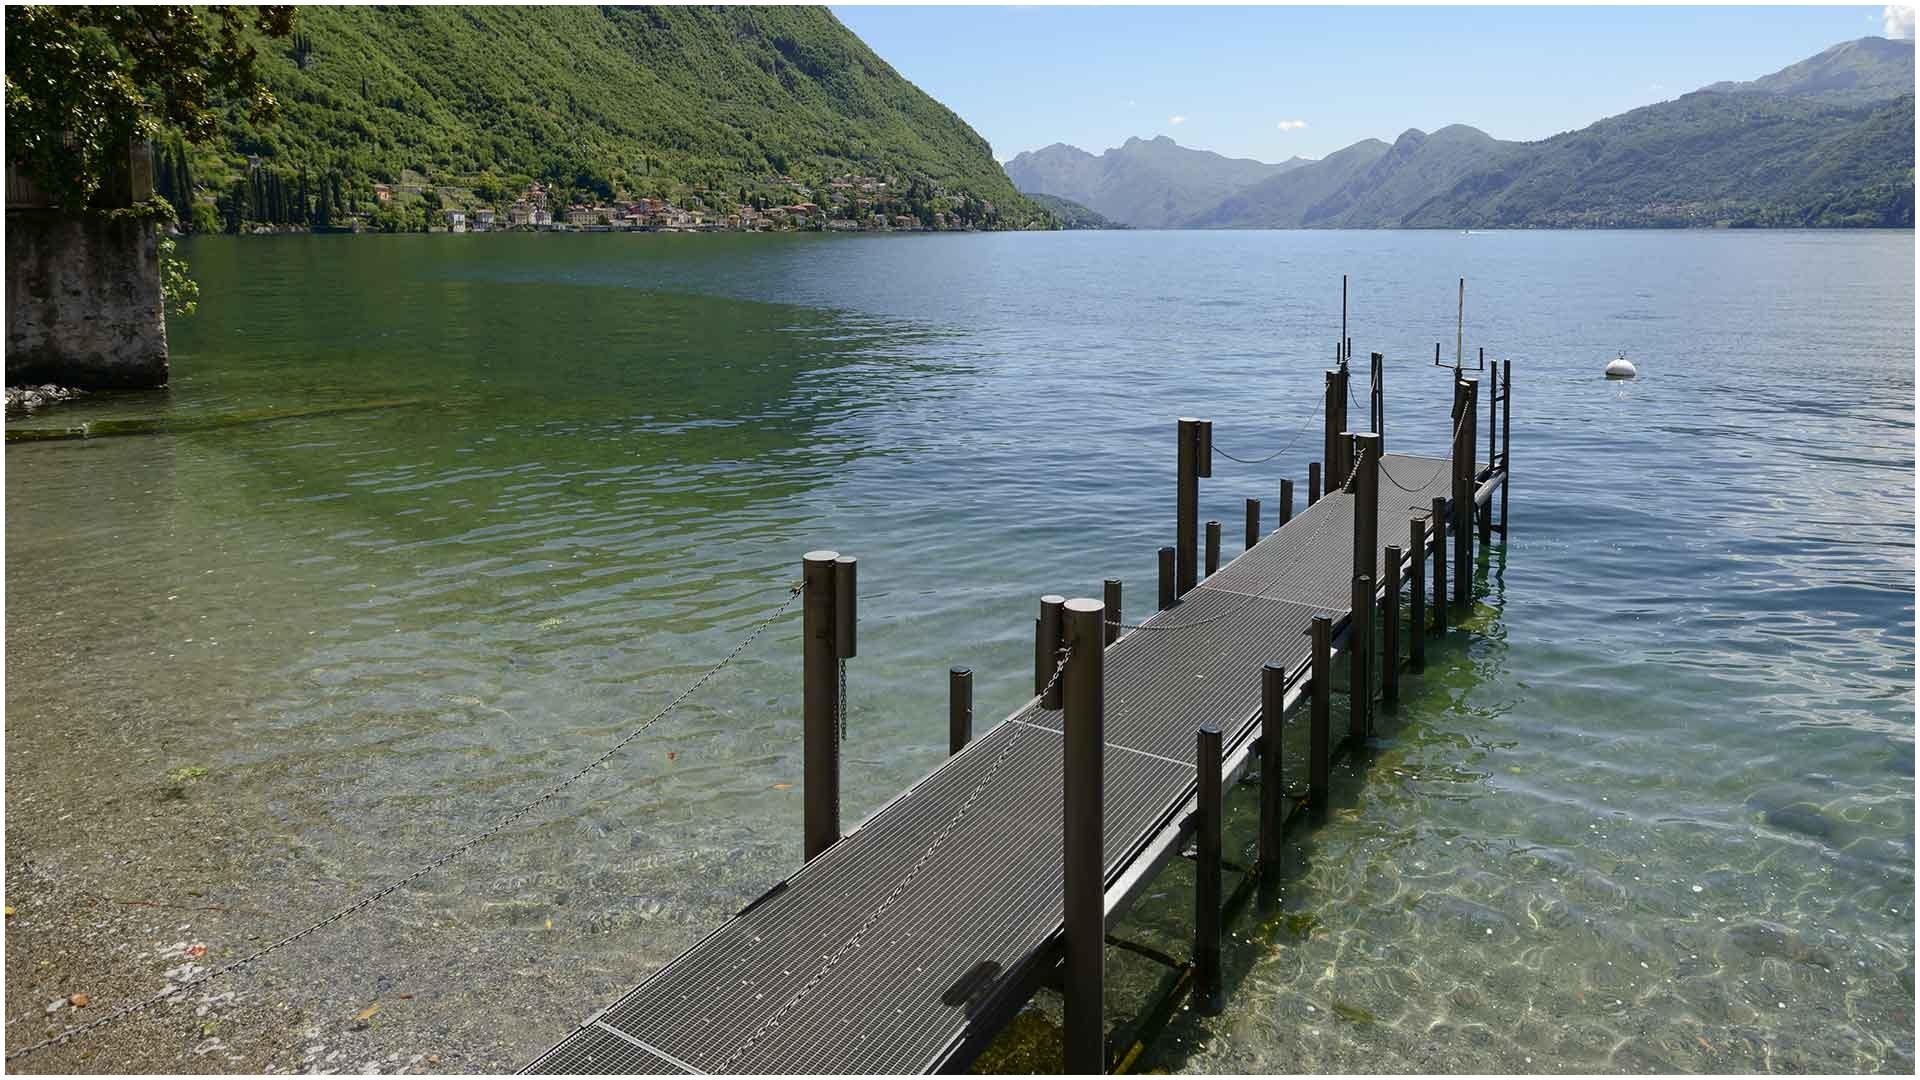 Beach Lecco Italy Beautiful Free Beaches On Eastern Branch On Lake O Sun Bath or Lake Bath